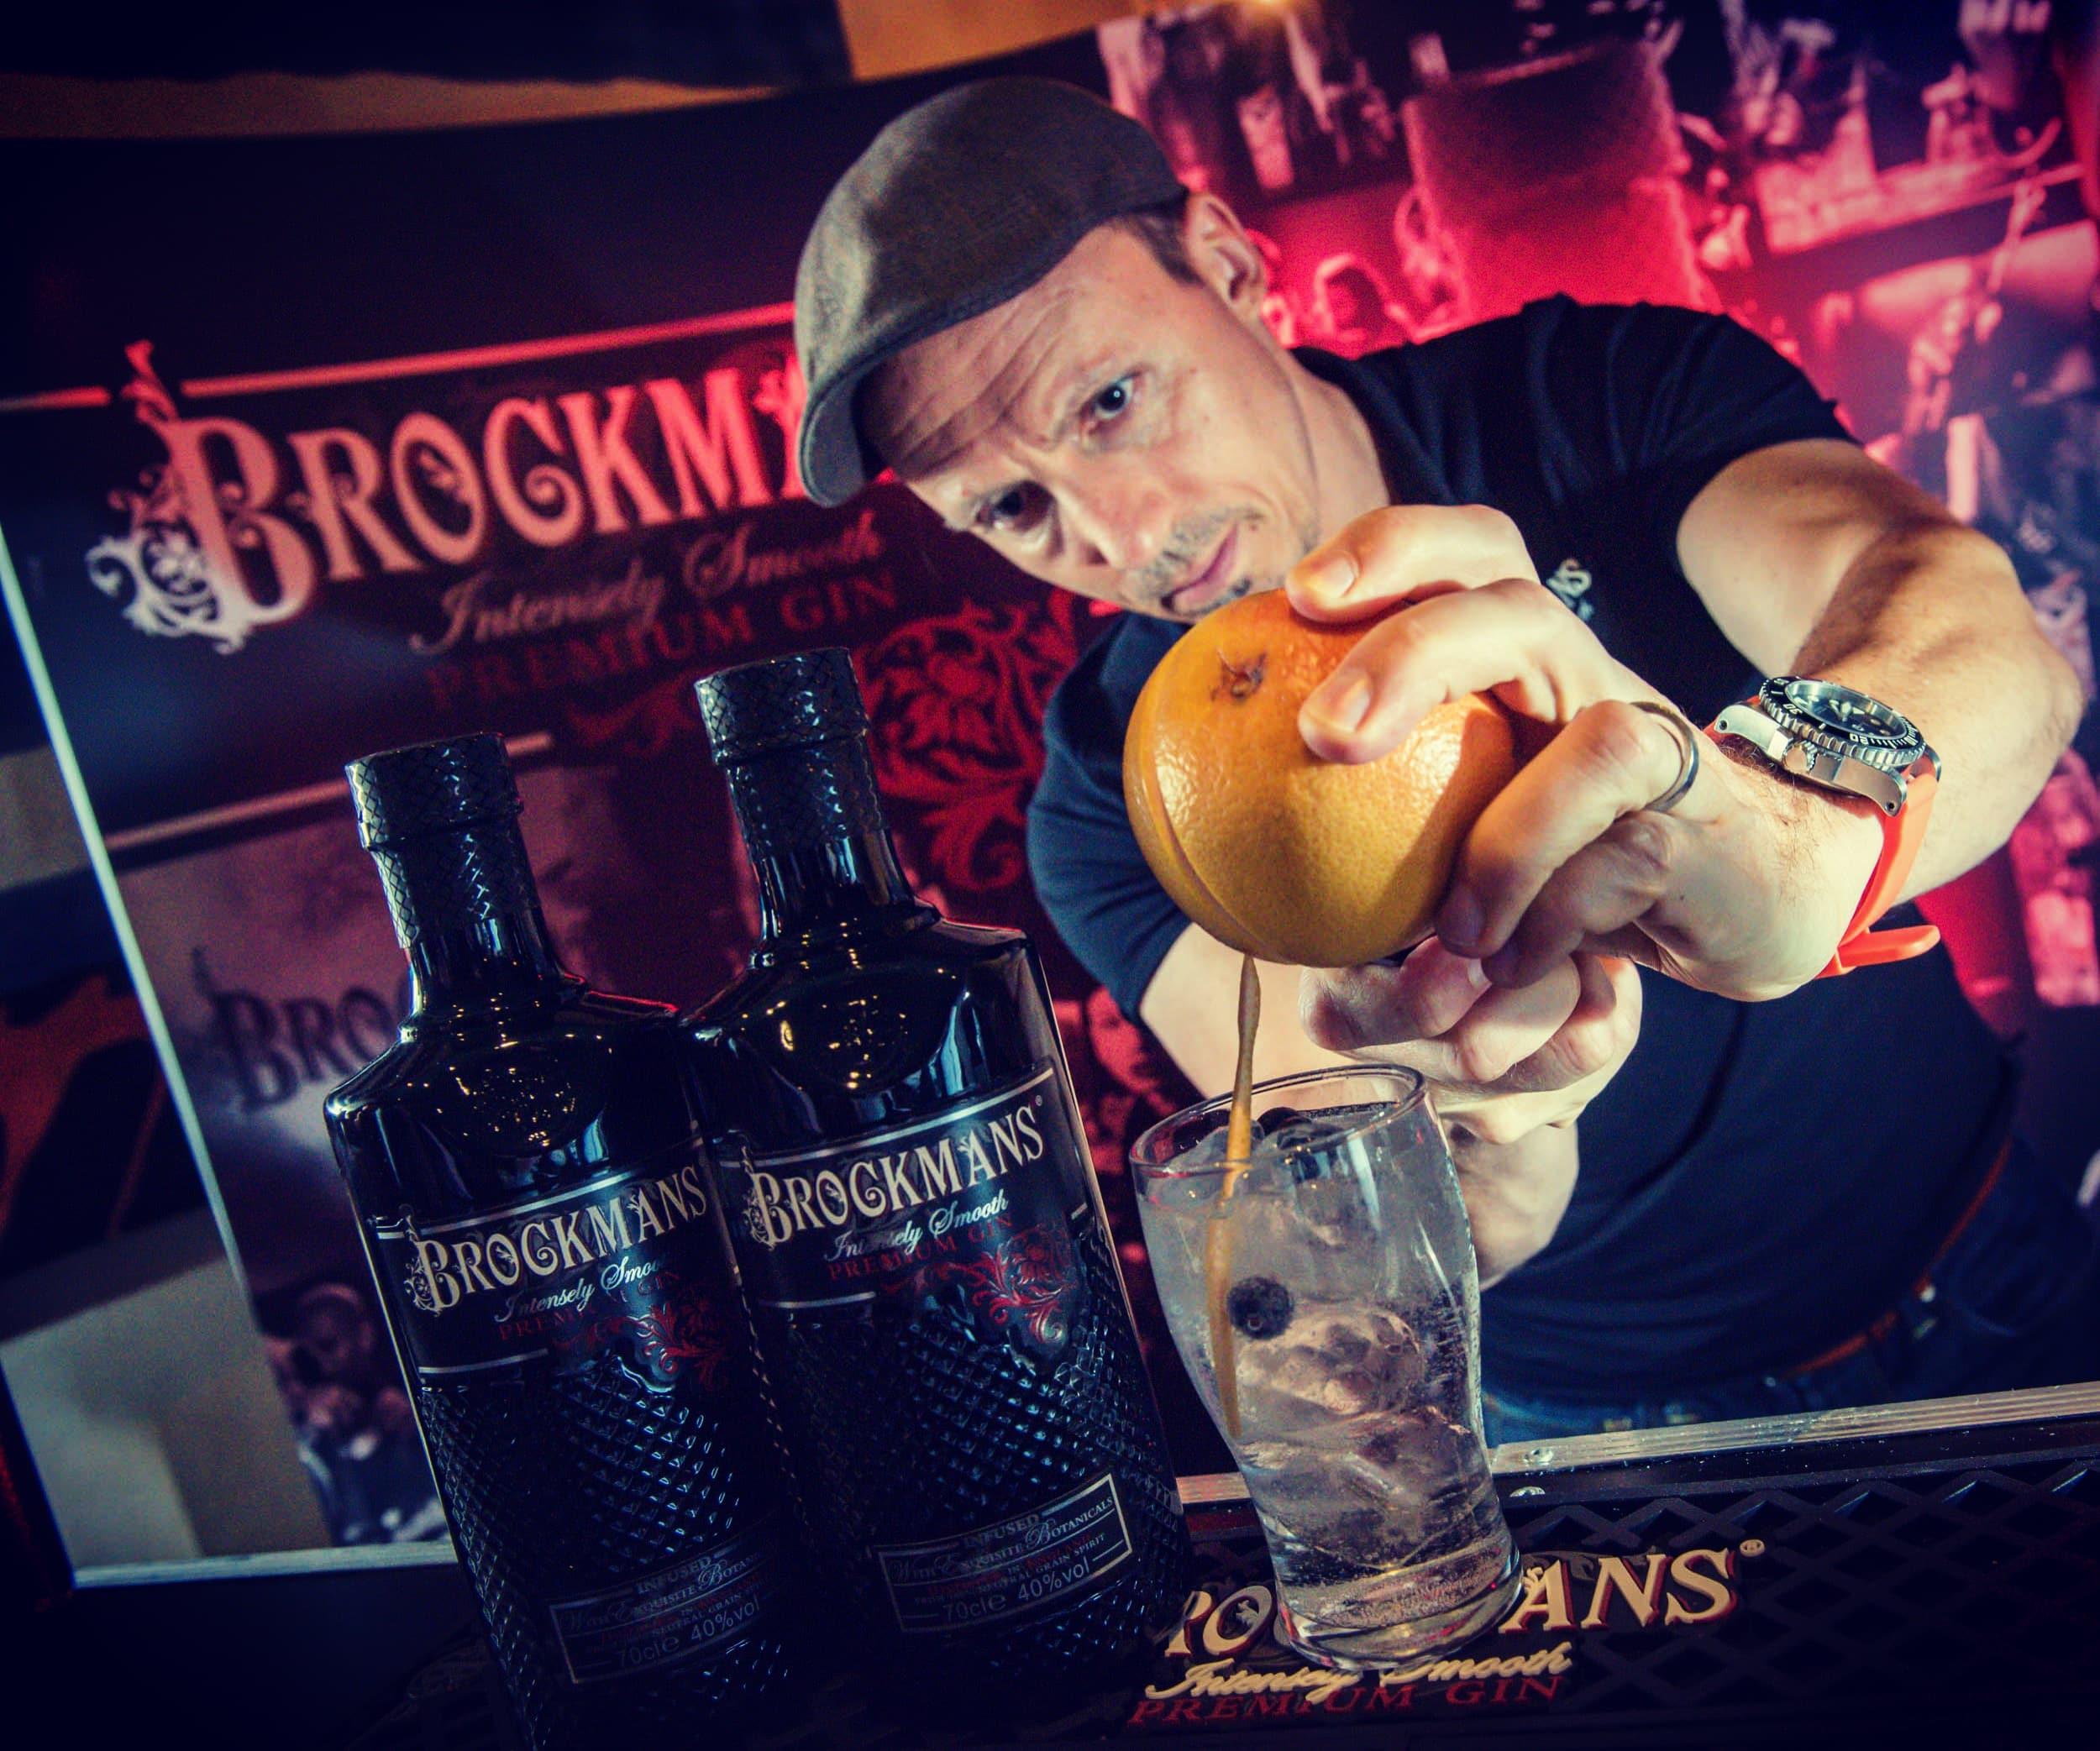 Barman pouring Brockmans cocktail